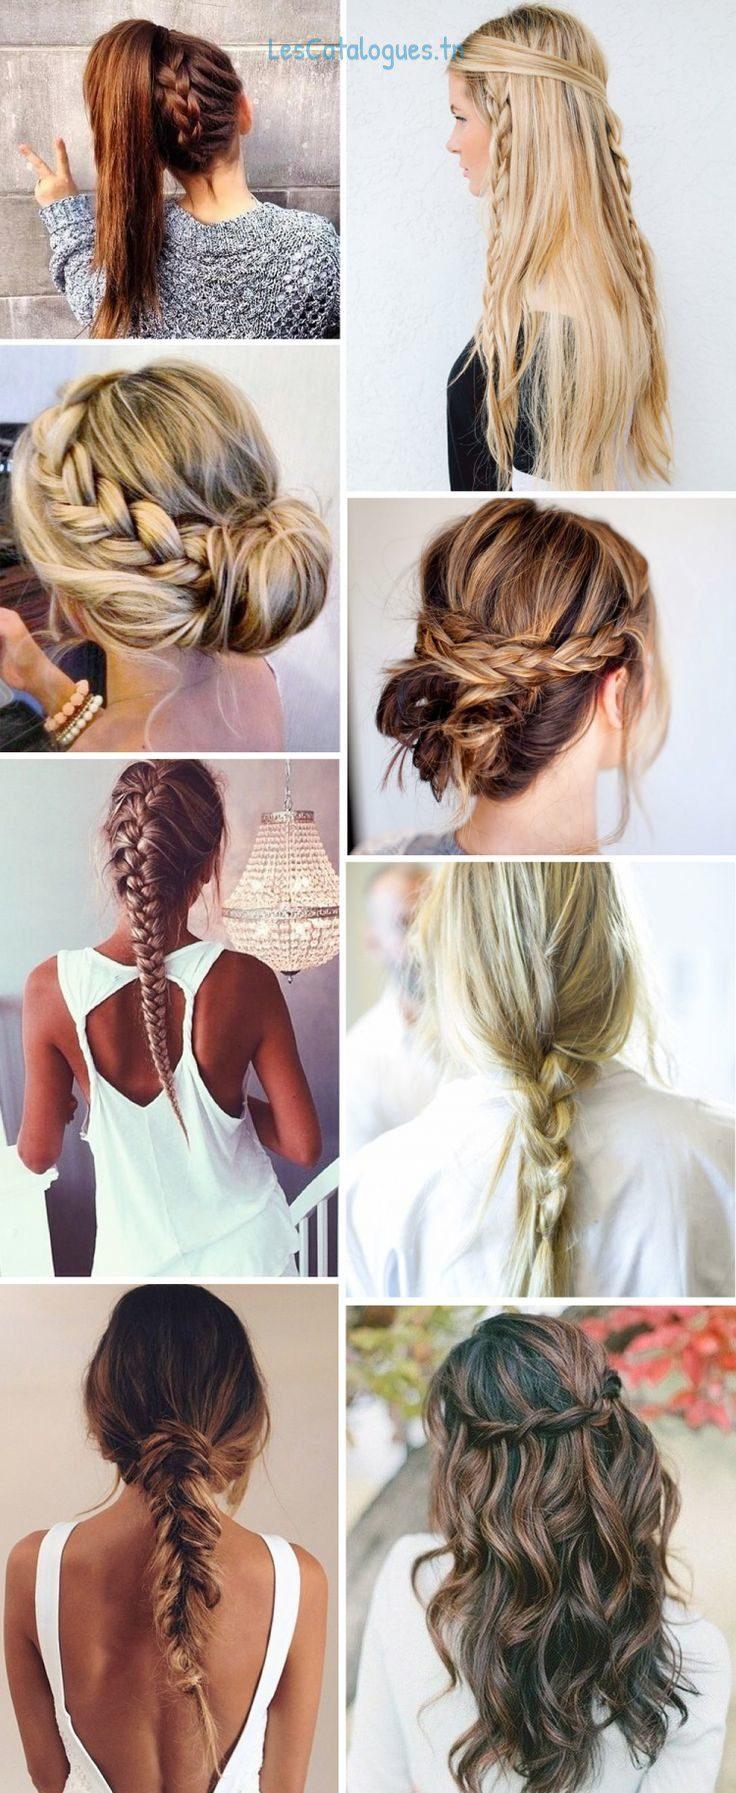 coiffure-cheveux-24